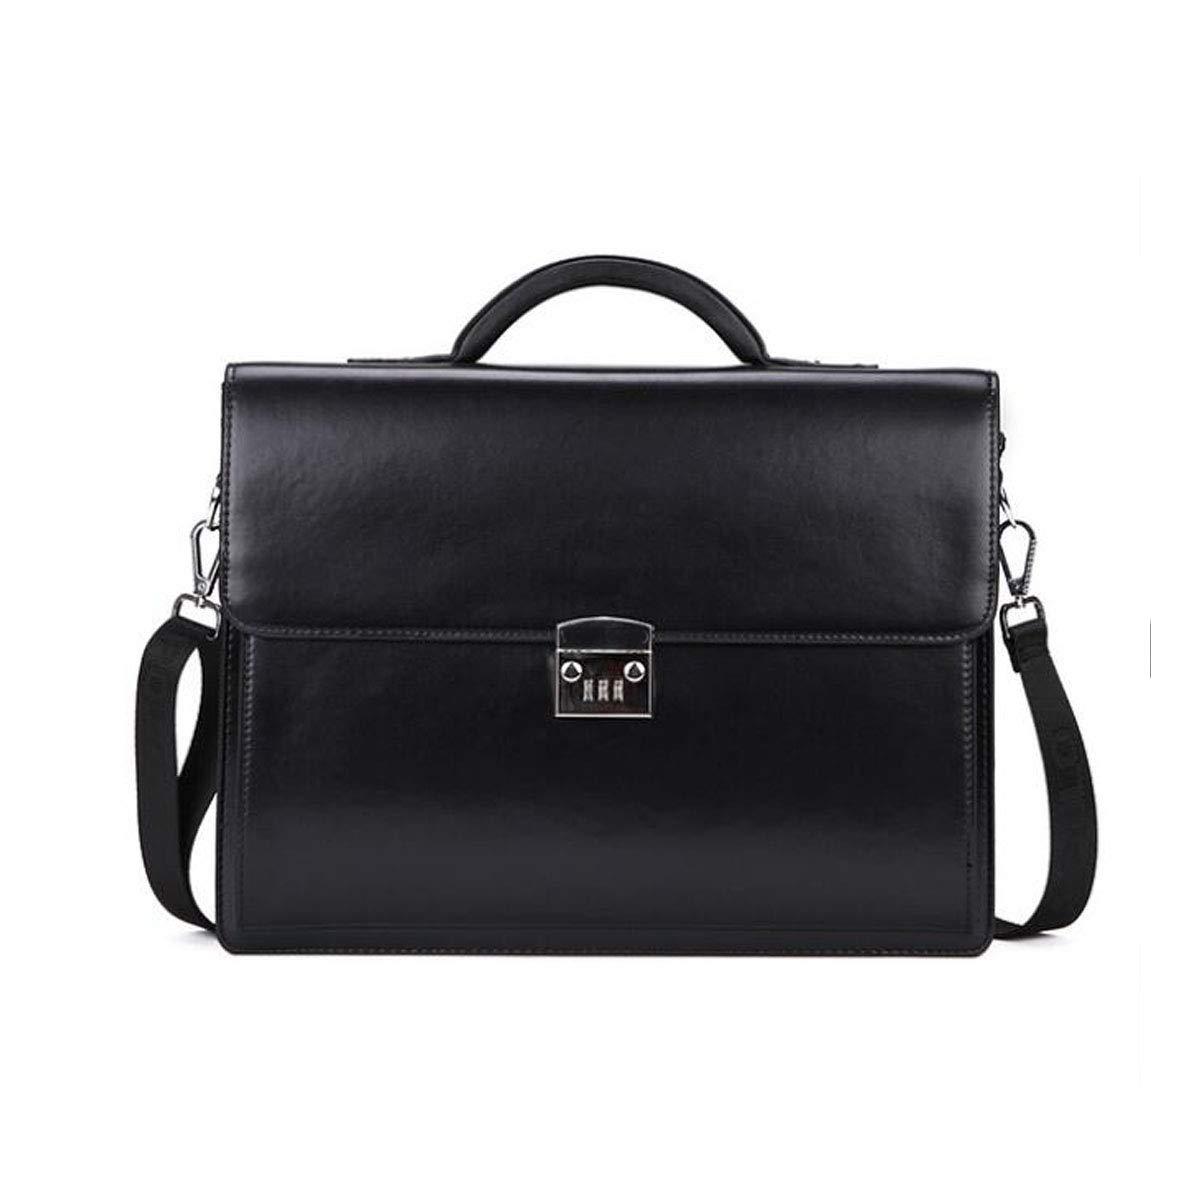 Jiansheng Briefcase One-Shoulder Diagonal Handbag with Anti-Theft Password Lock Placing Valuables Black Size: 36929cm Beautiful Suitable for Office Color : Brown